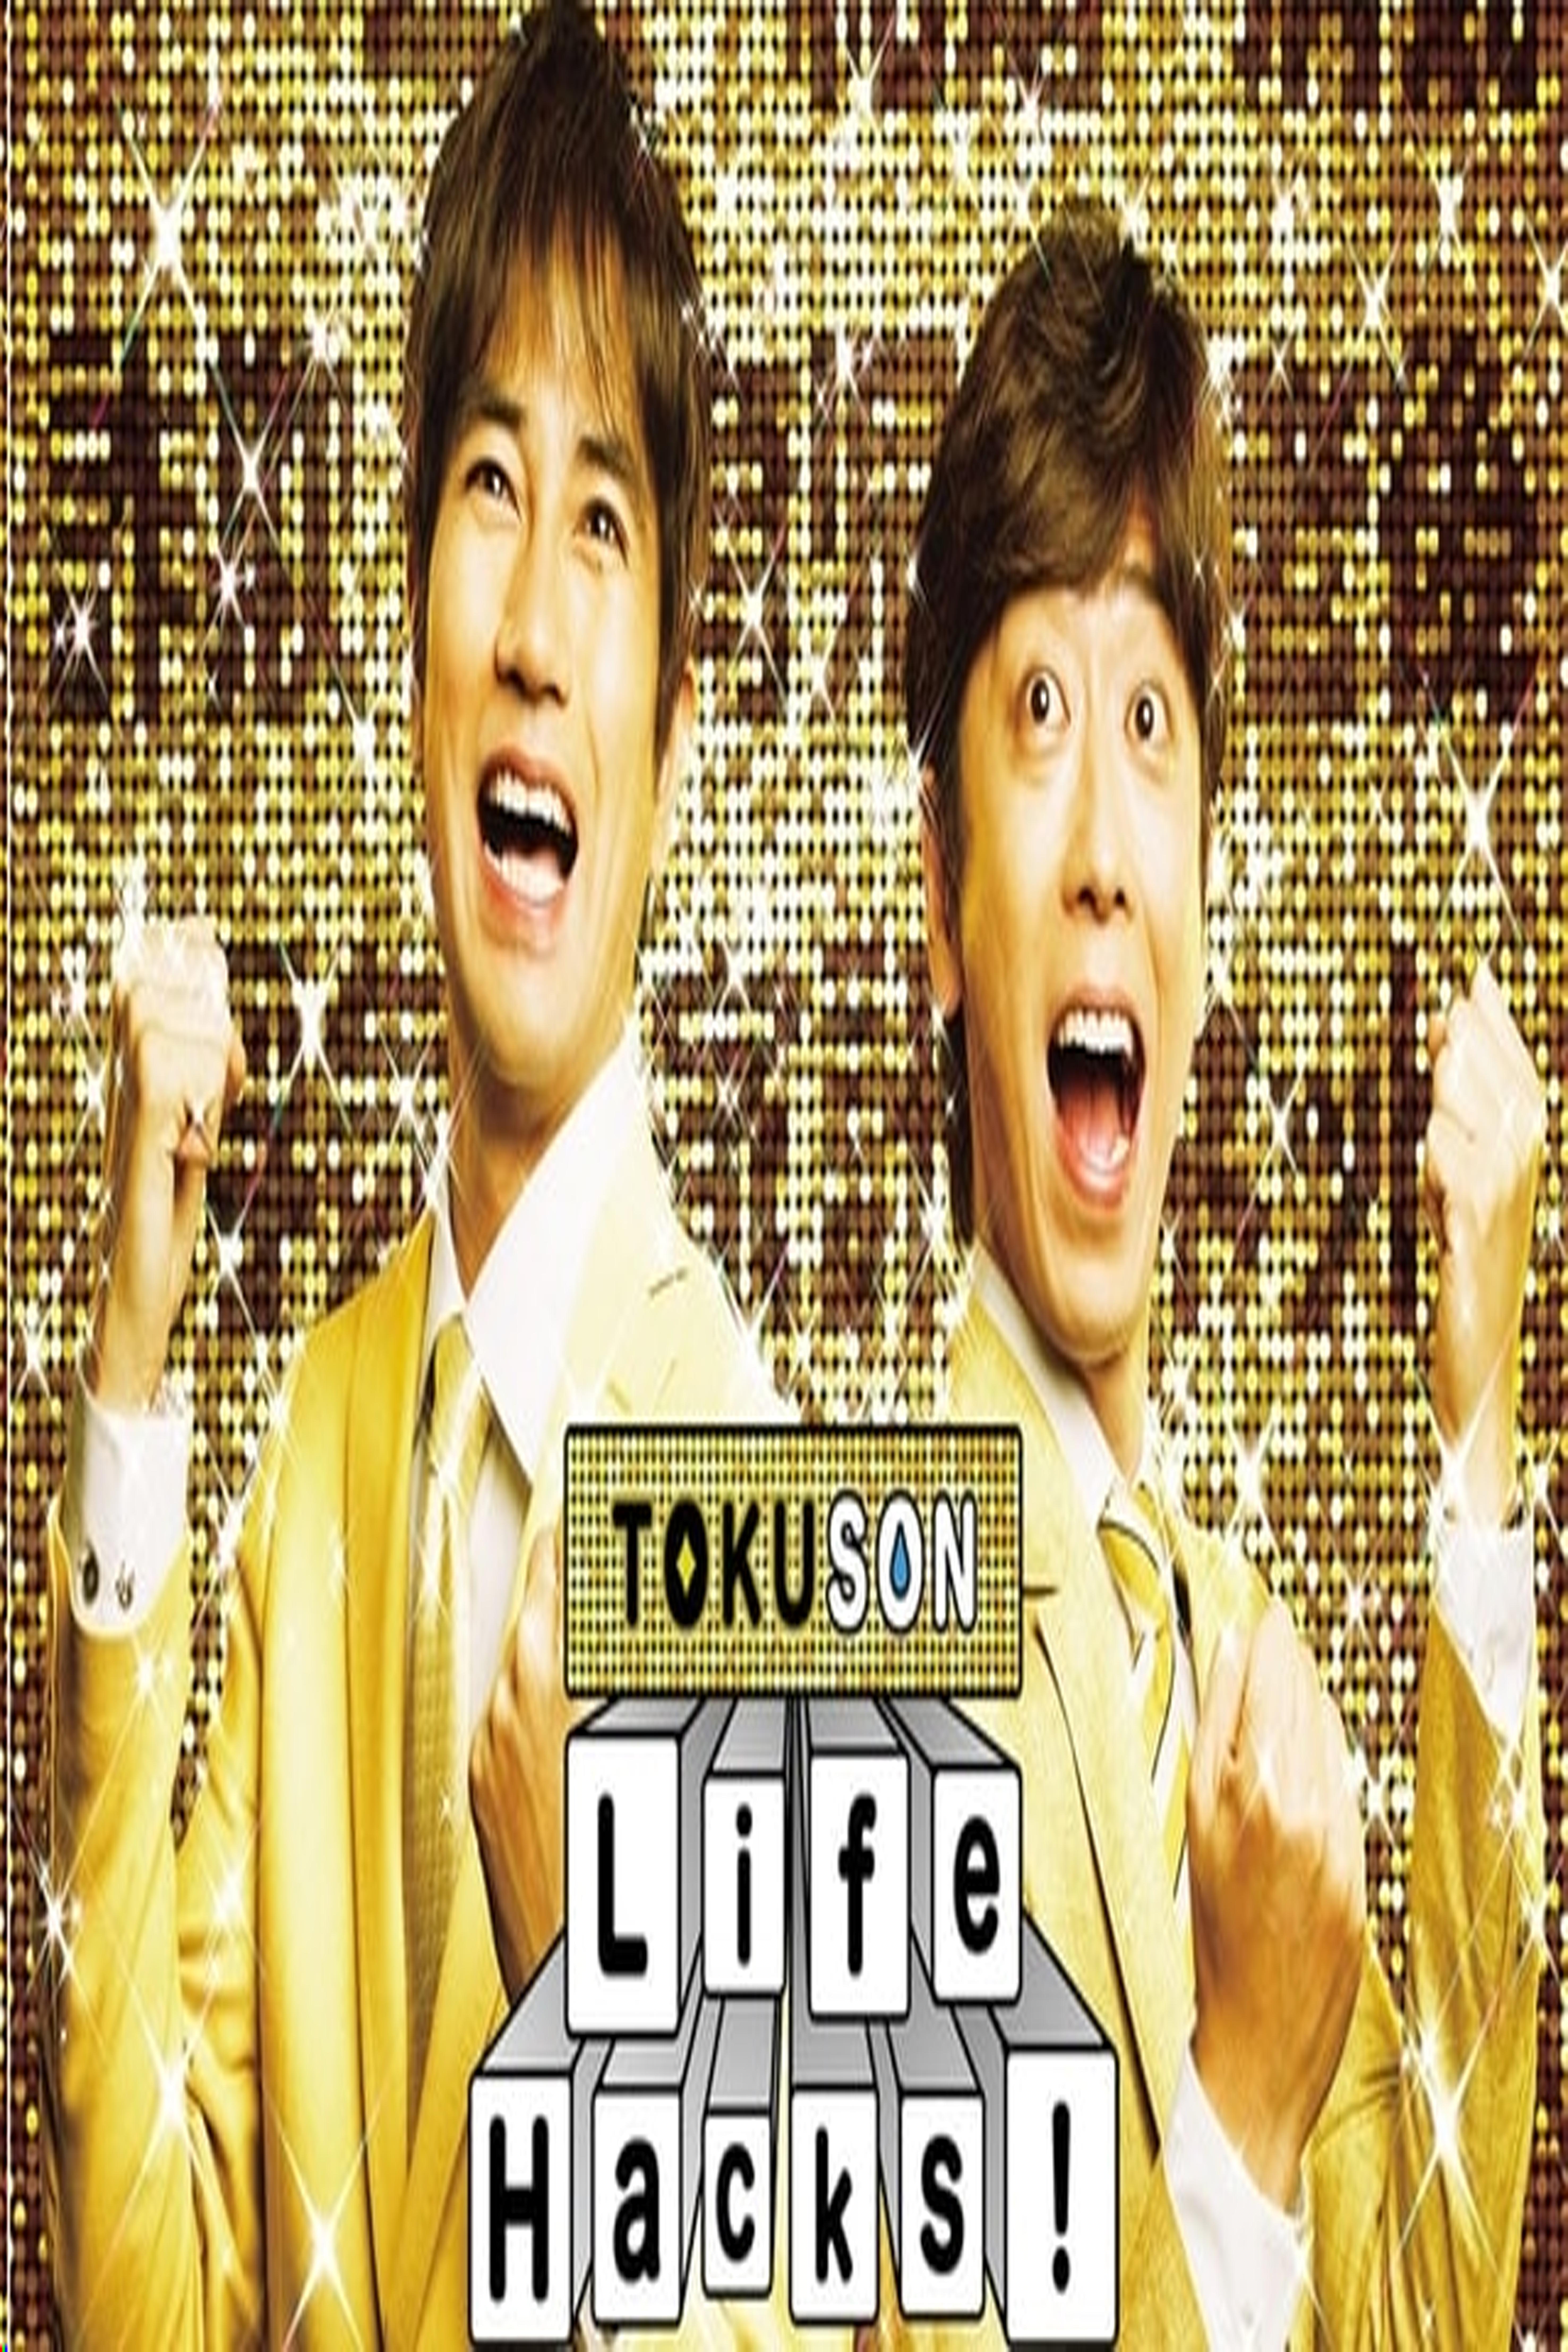 TOKUSON: Life Hacks! - 生活小貼士